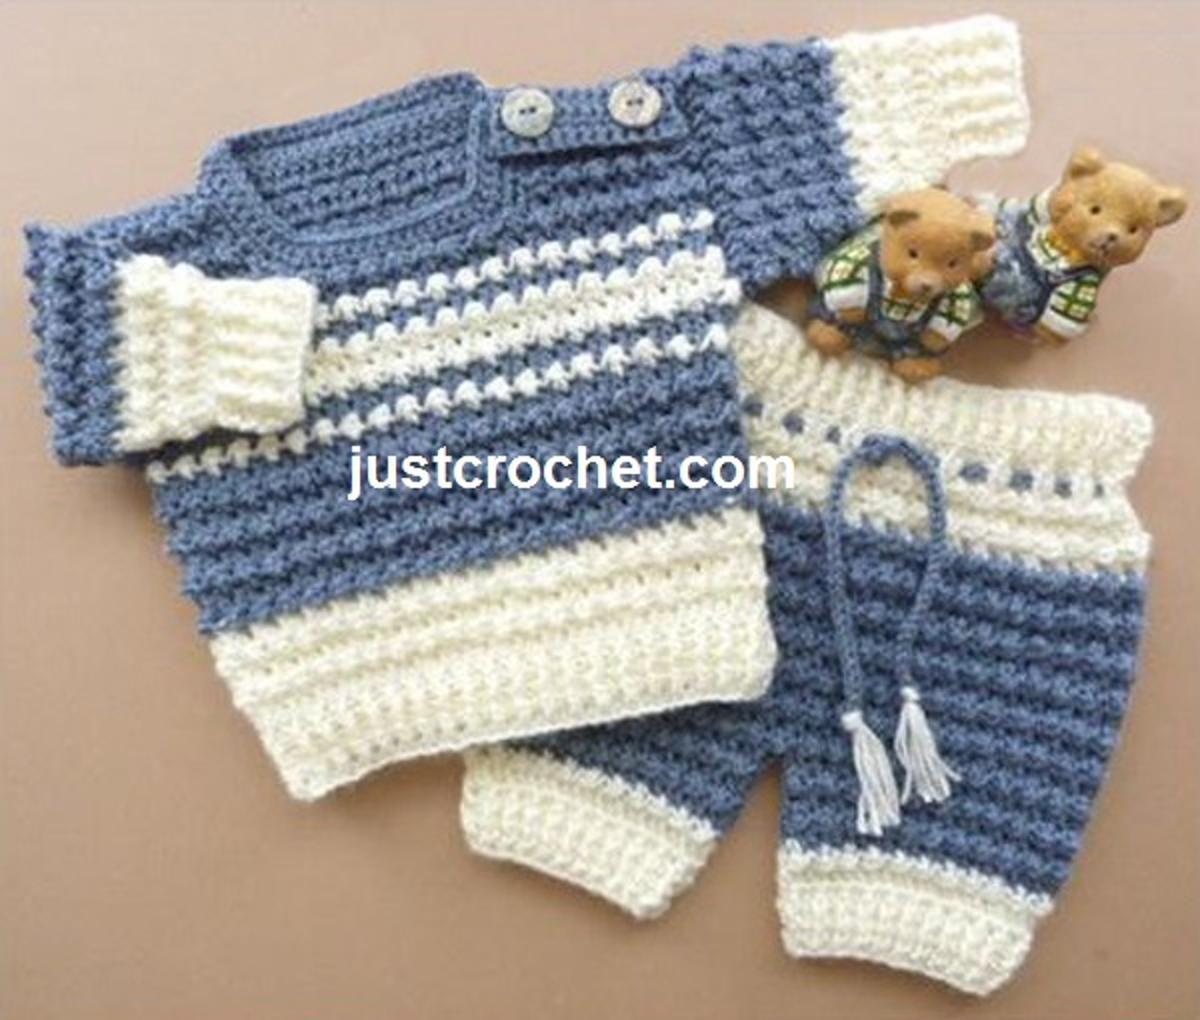 fjc13-Boys Sweater and Pants Baby Crochet Pattern | Crochet ...